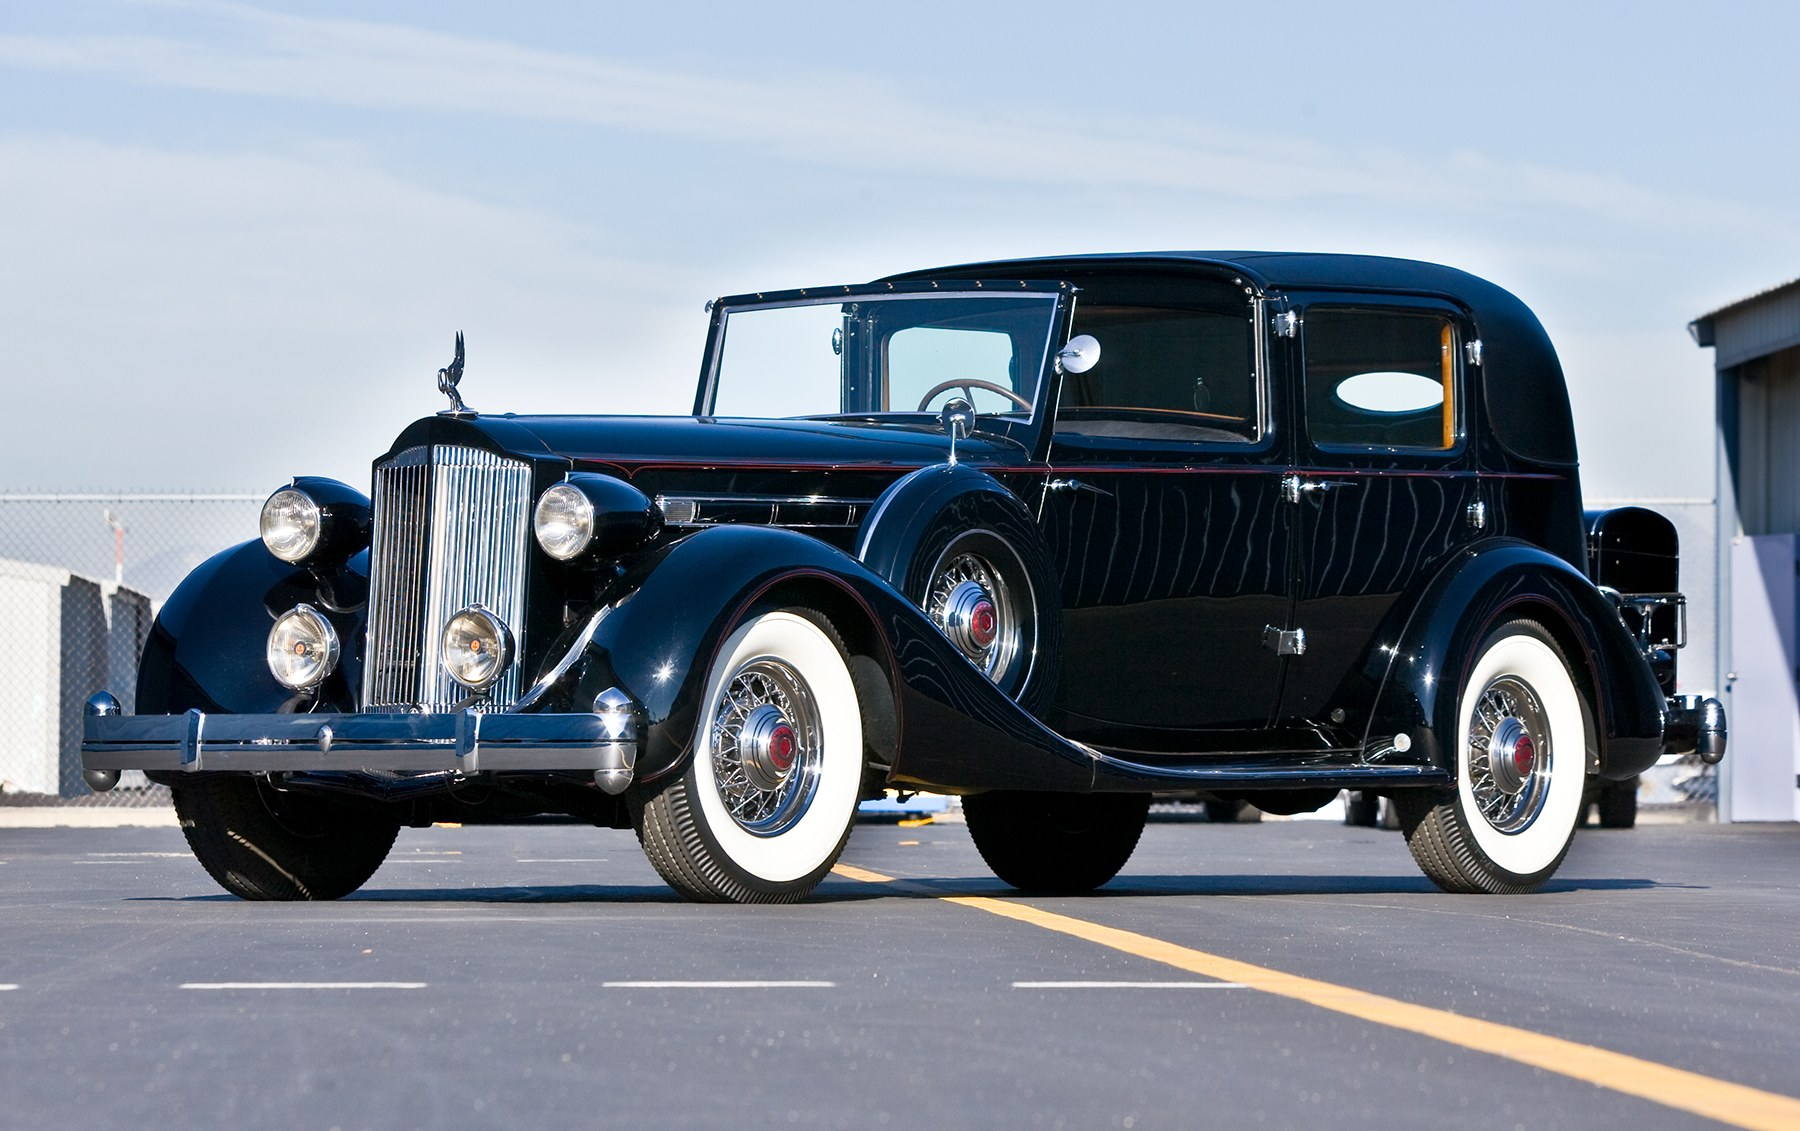 1935 Packard Twelve Model 1207 Town Car